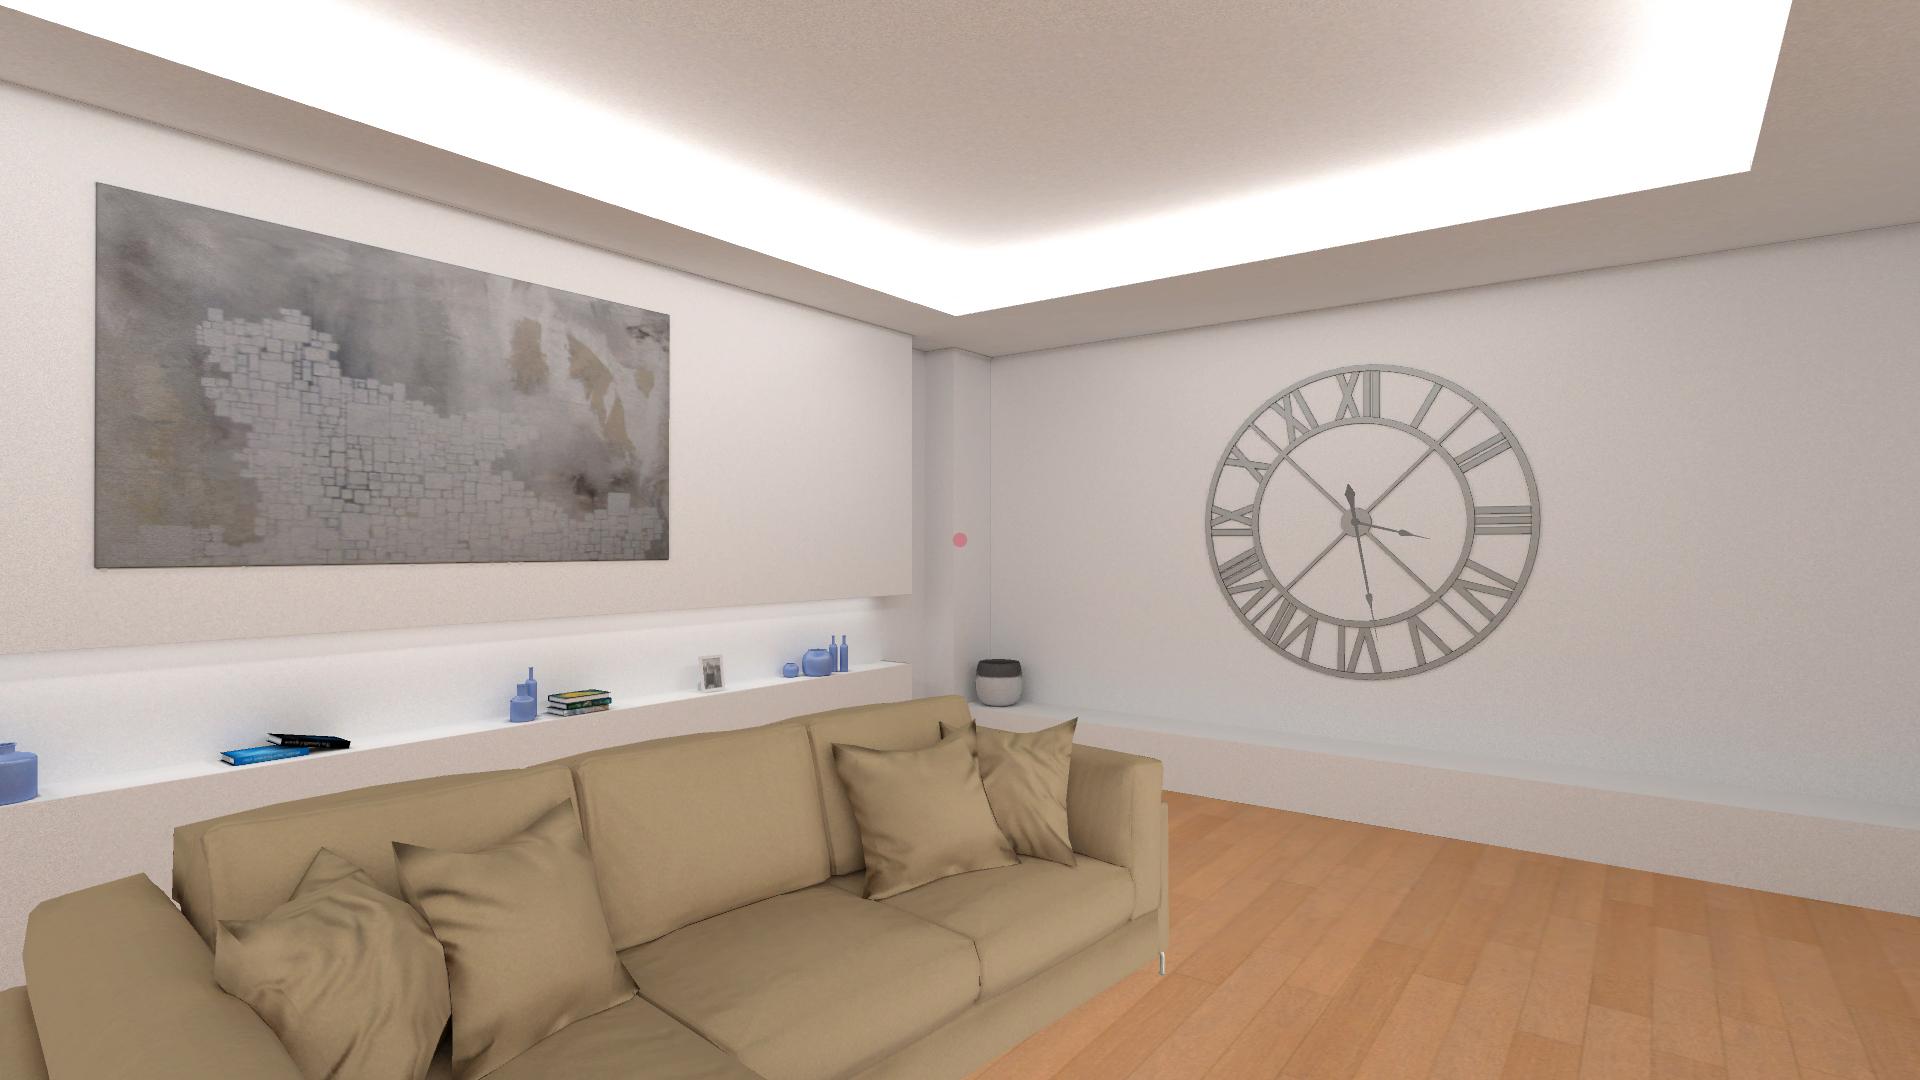 catalogo virtuale divano pelle tessuto sabbia